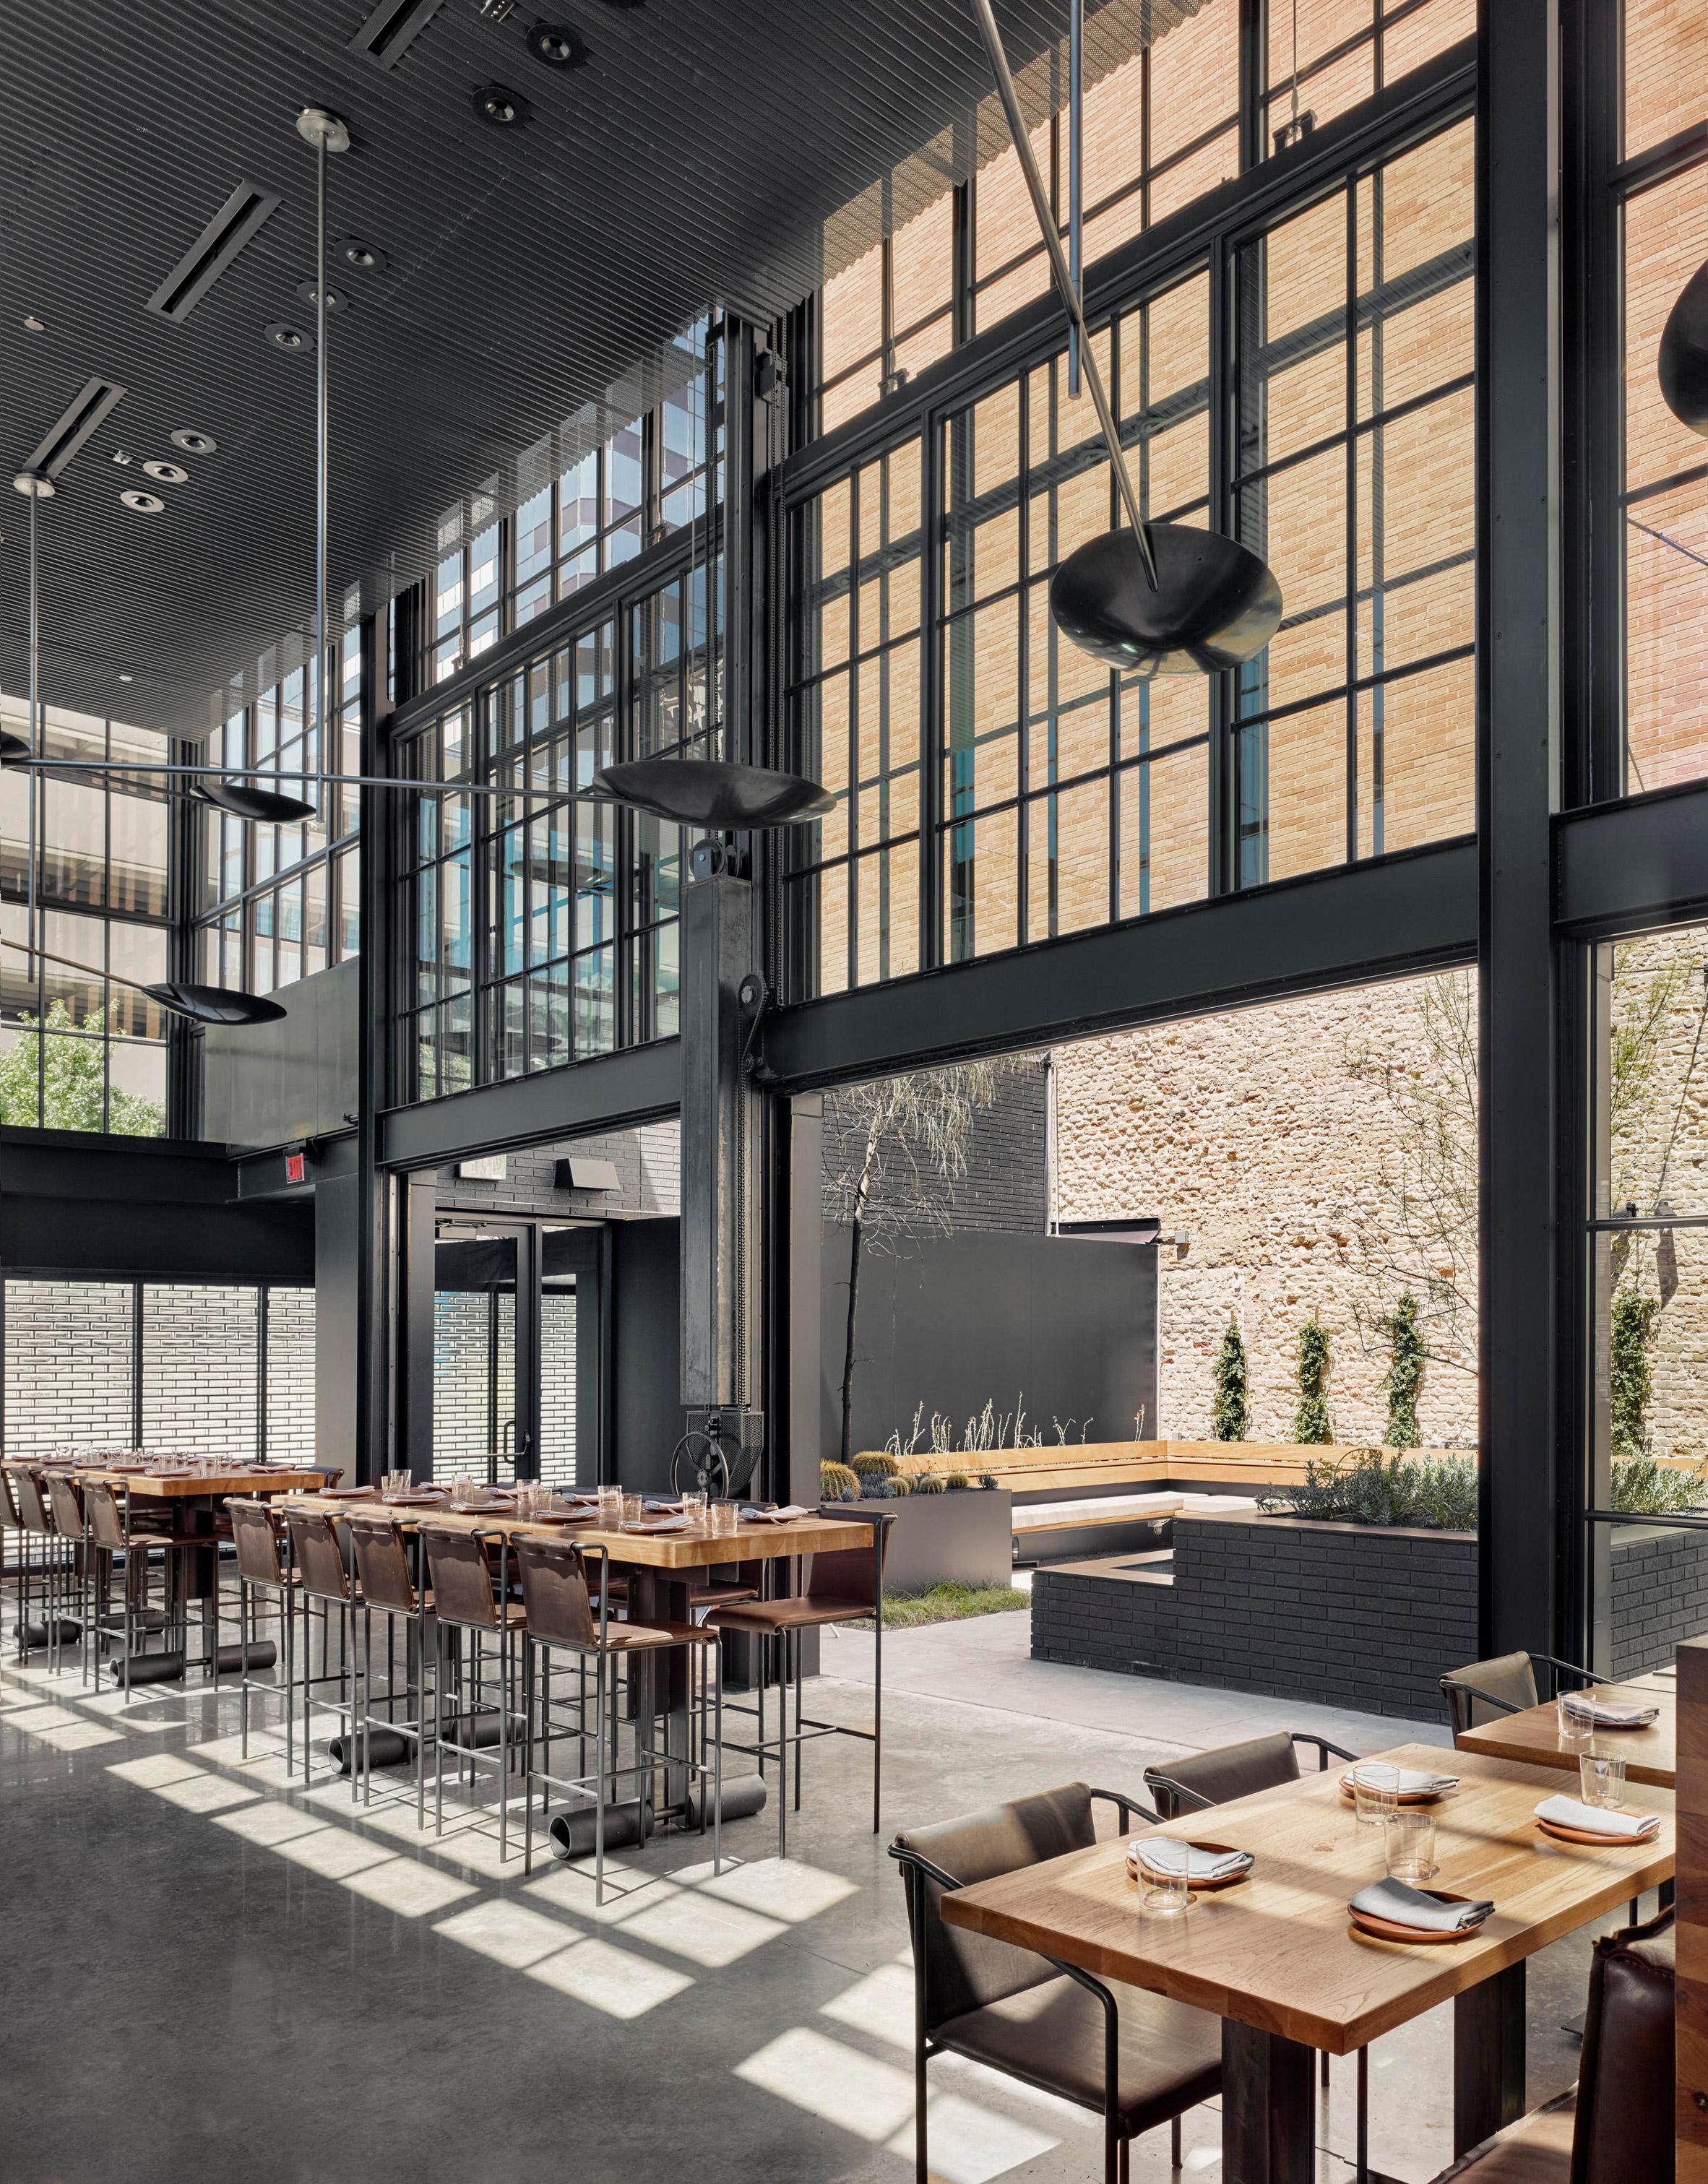 Comedor restaurant in Austin by Olson Kundig